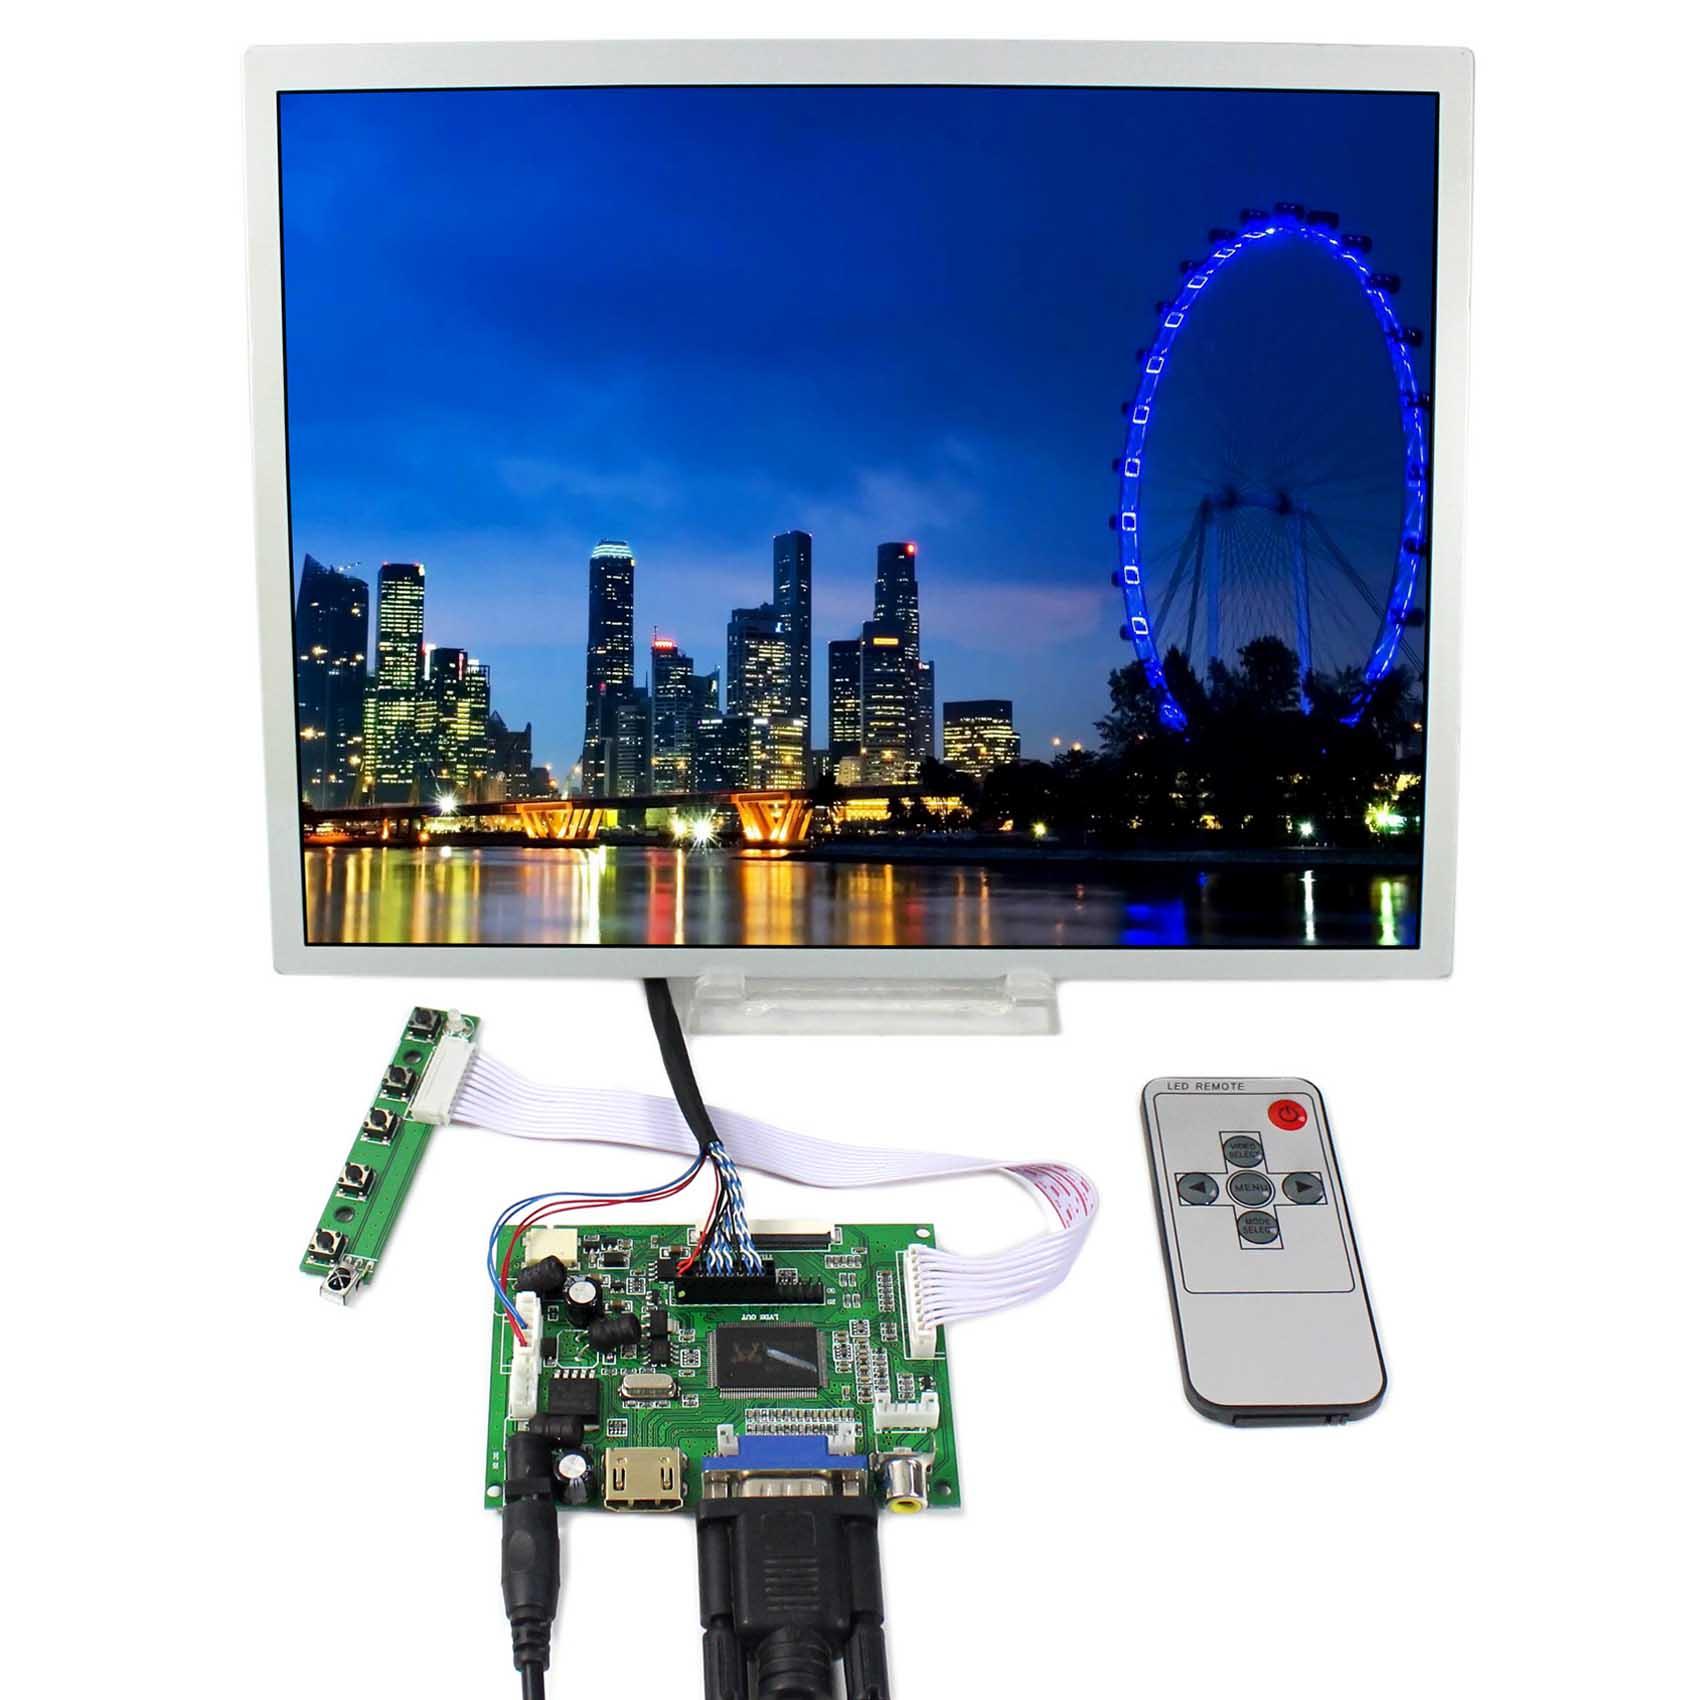 HDMI VGA 2AV LCD LCD valdiklio plokštė + 12,1 col. LQ121S1LG75 800x600 LCD ekranas